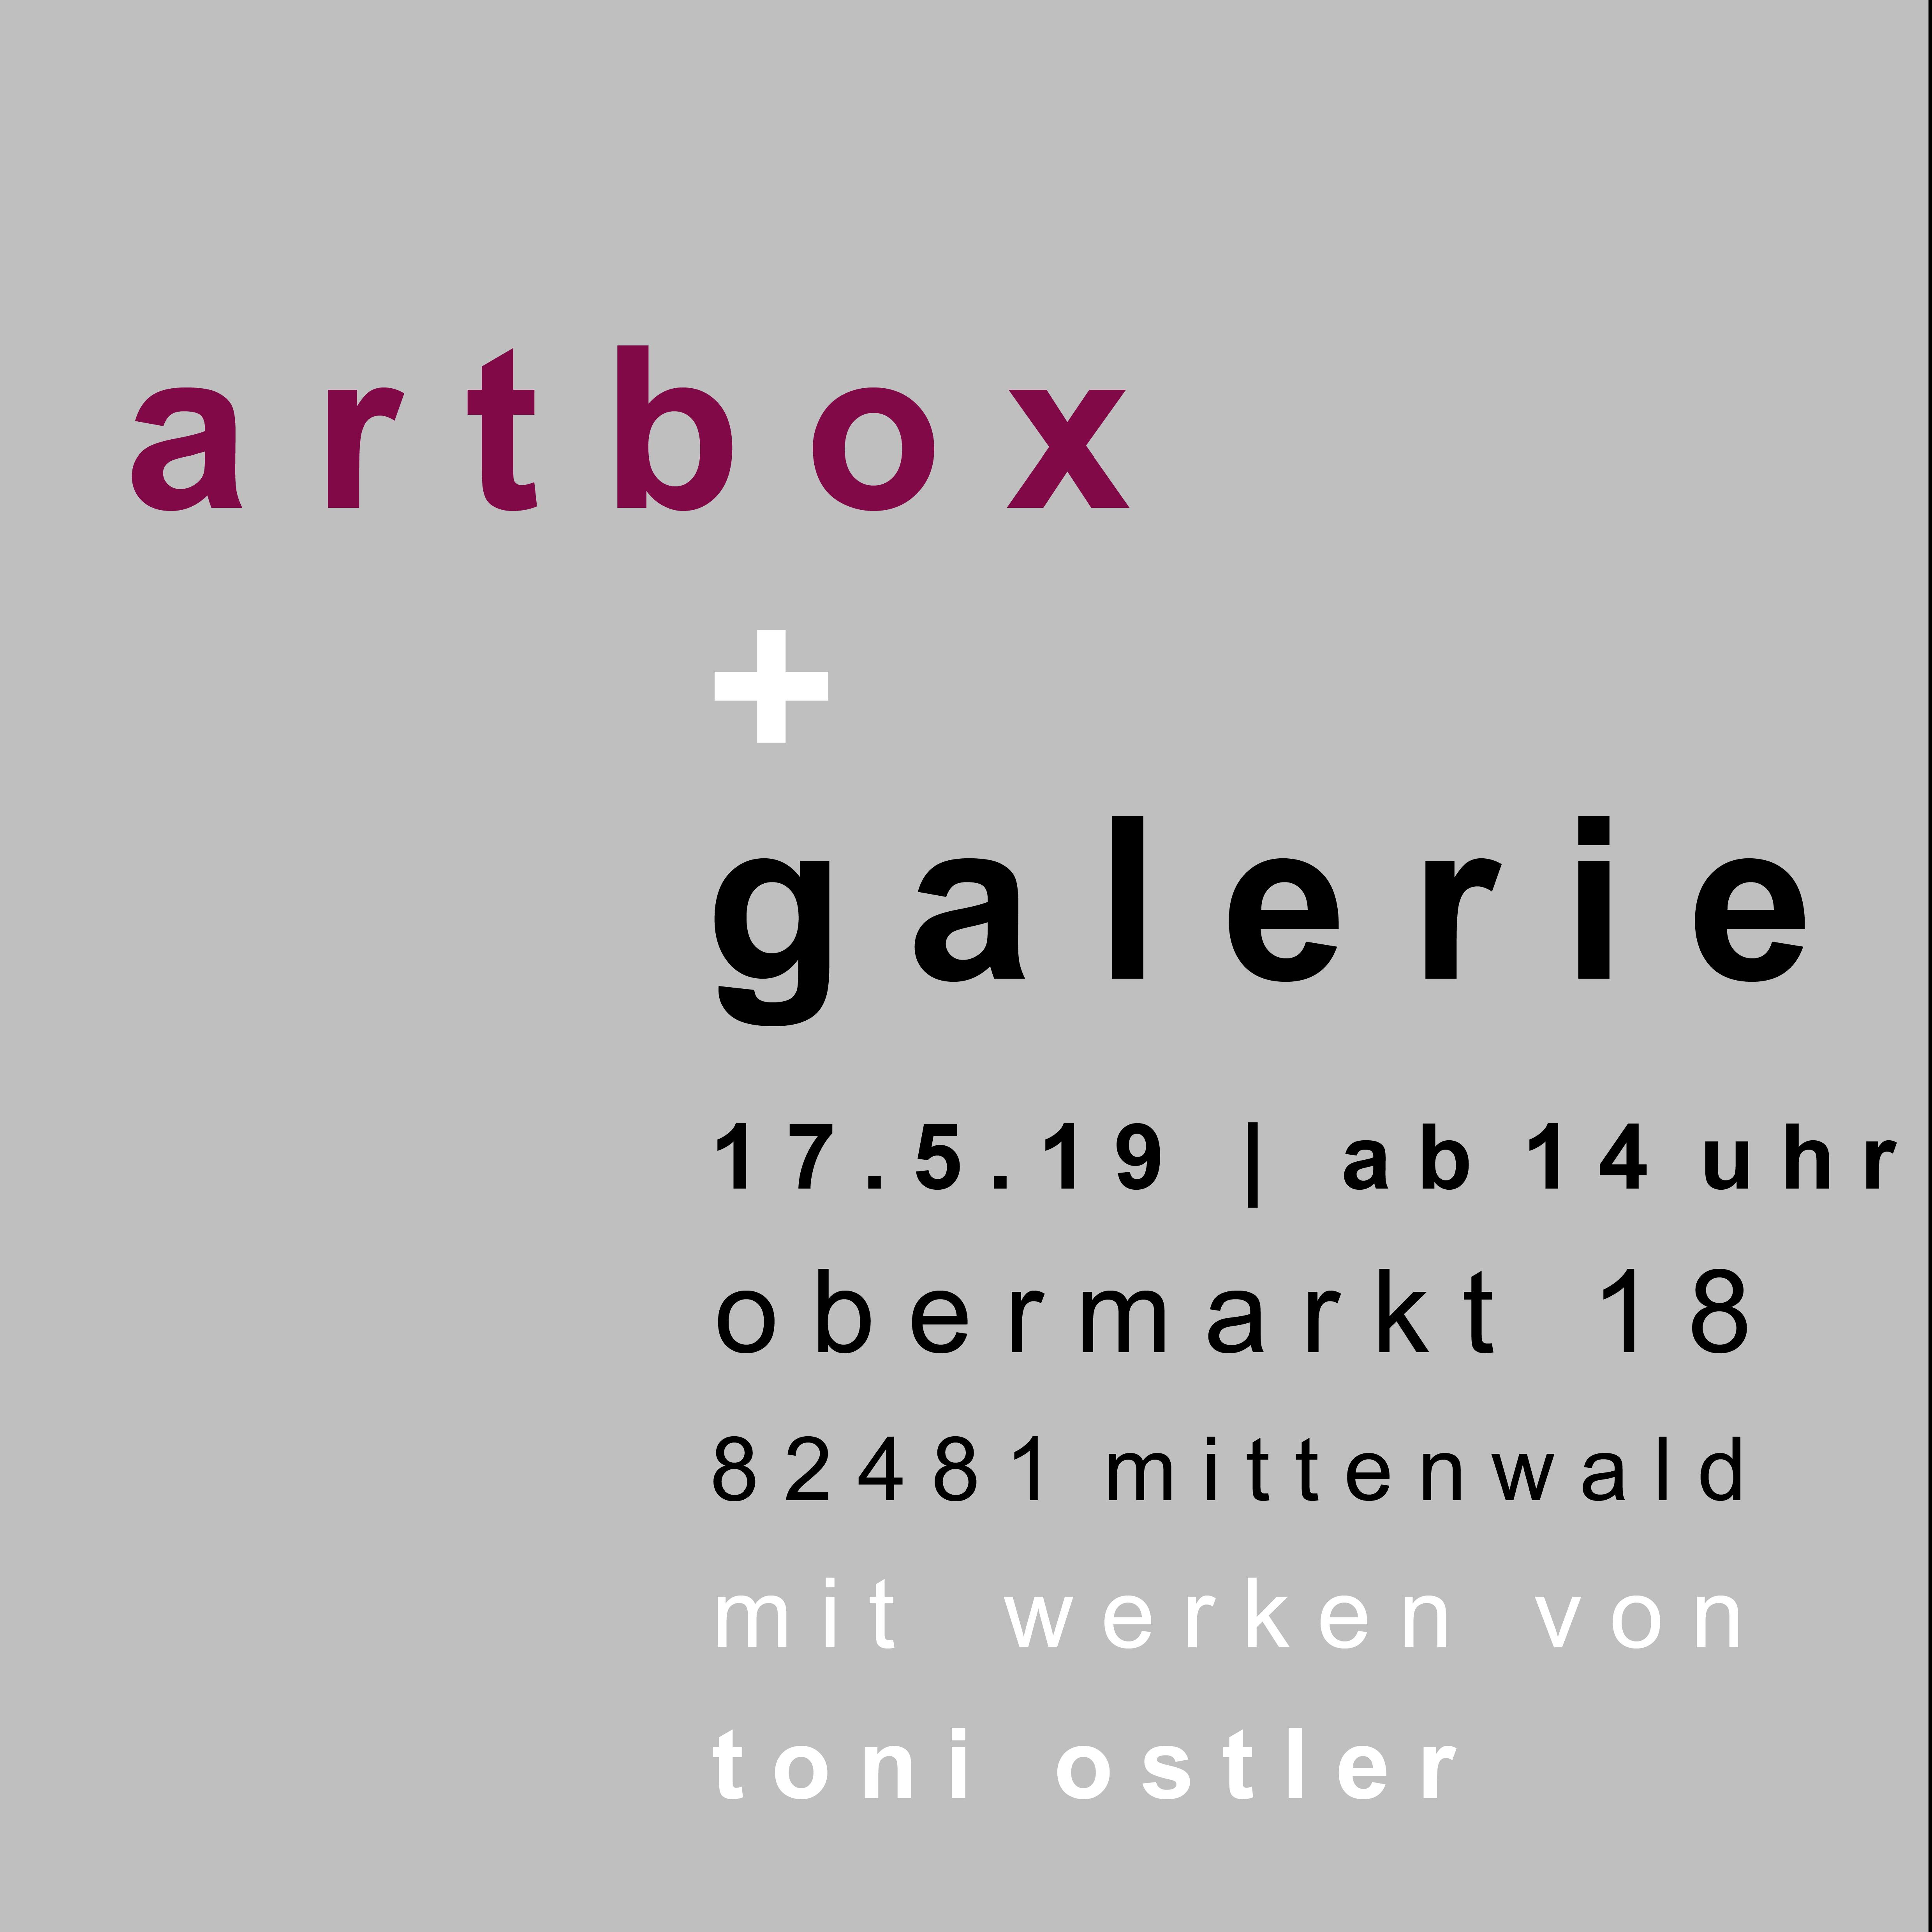 Artbox & Lifestyle Galerie